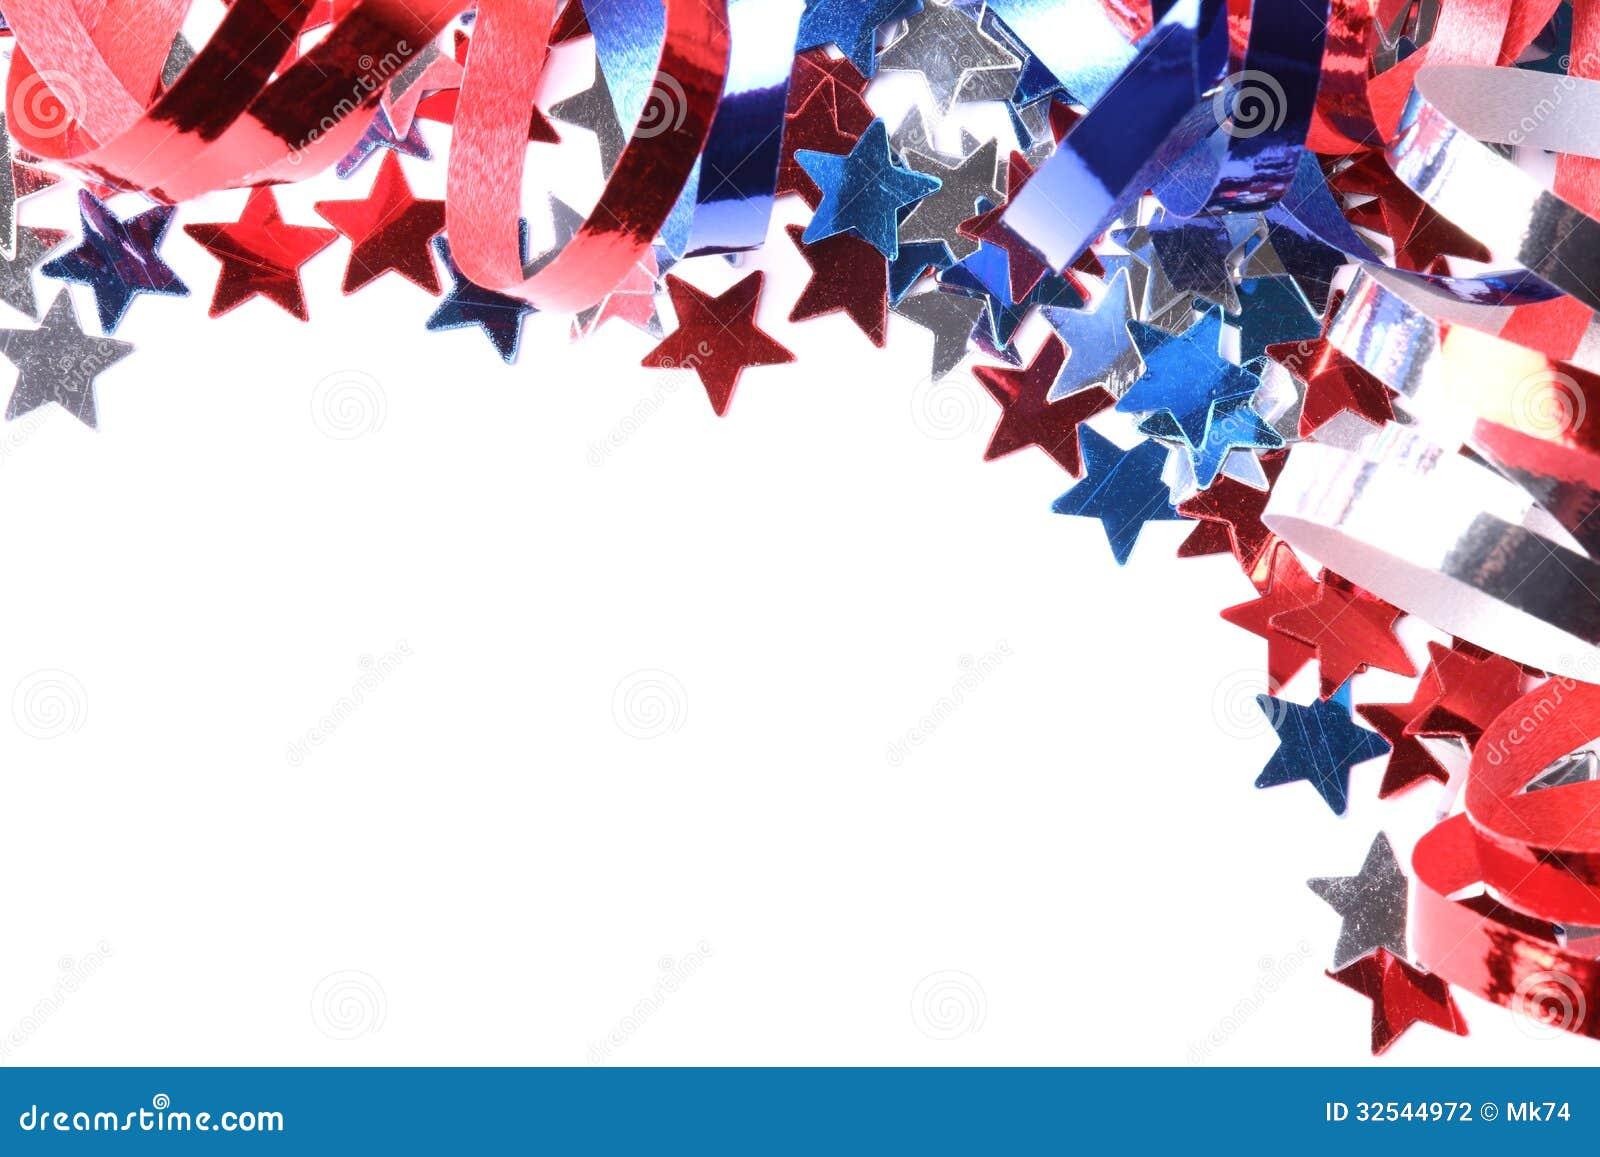 patriotic background stock photo image of space macro 32544972